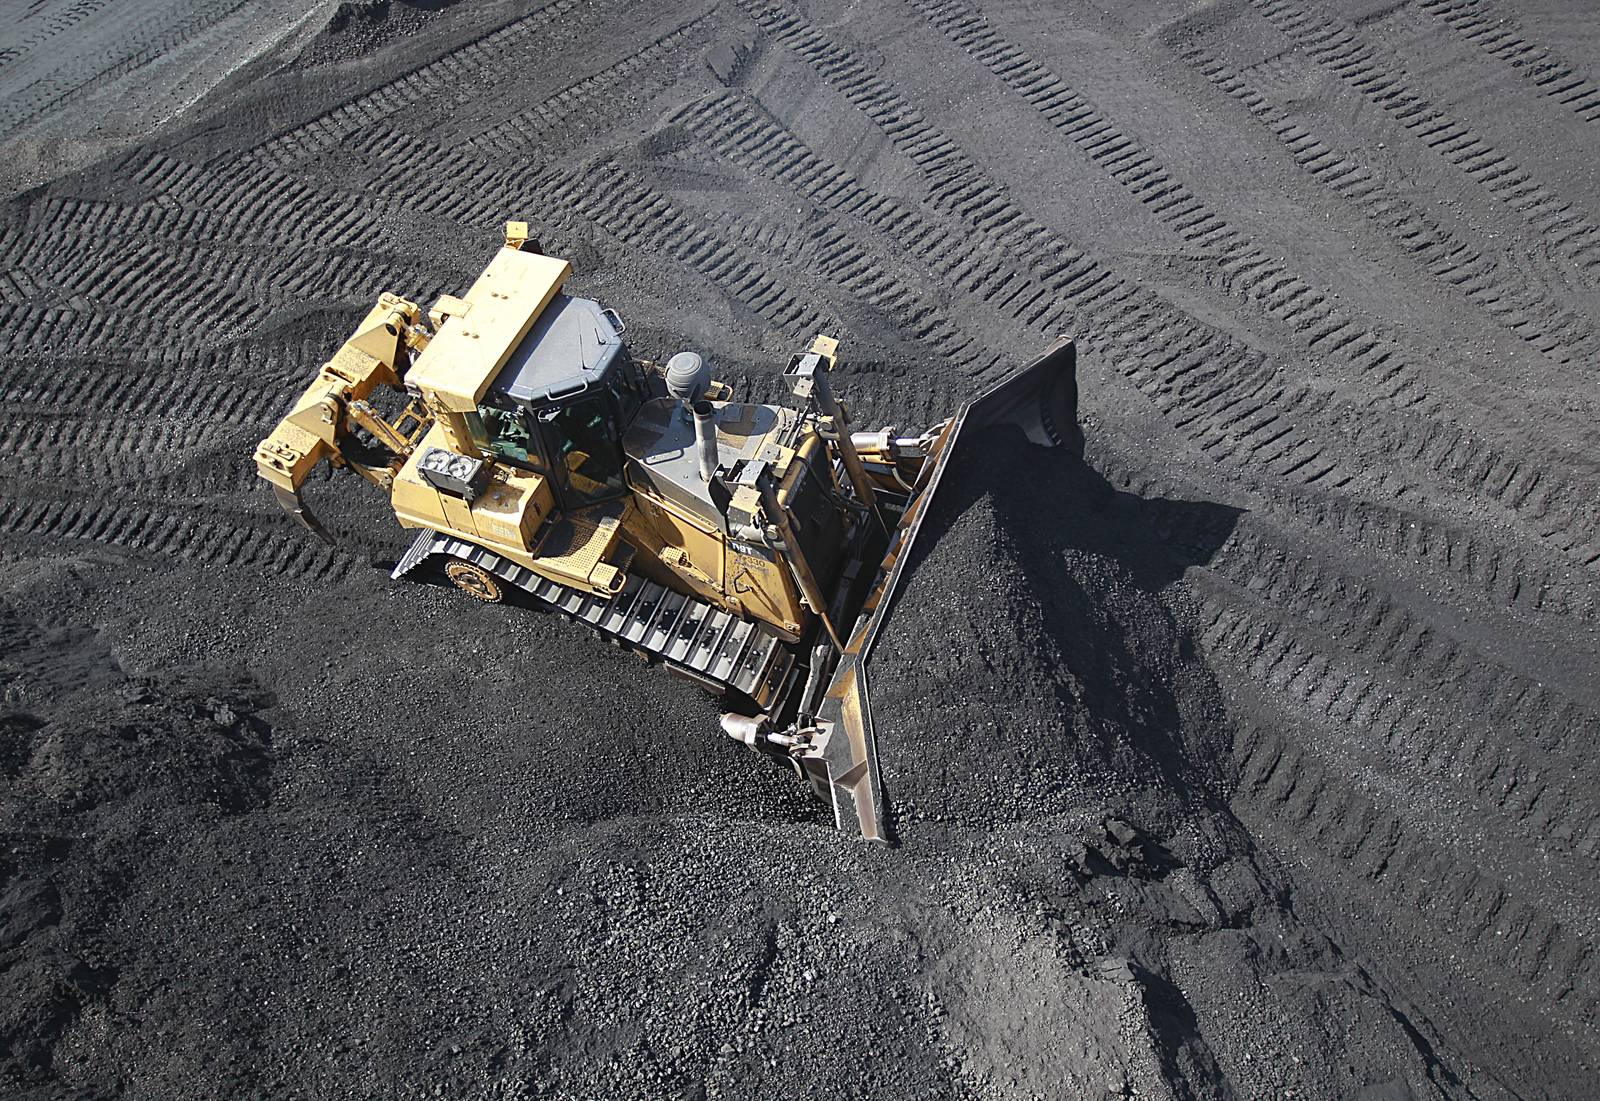 A coal terminal in Utah. Credit: George Frey/Getty Images